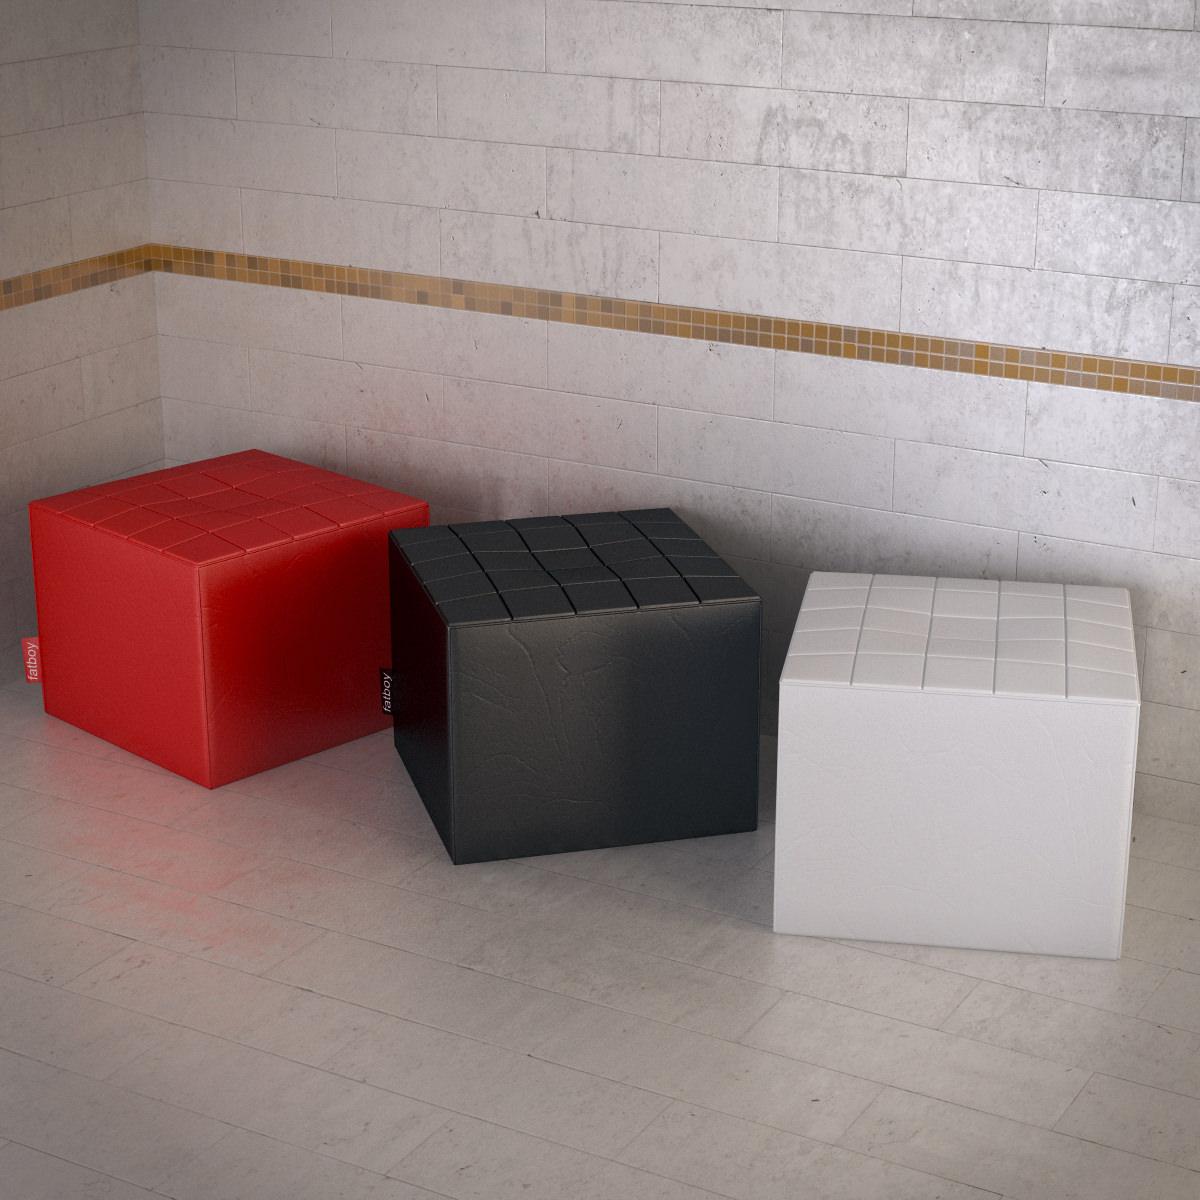 Topdeq fatboy puf furniture chair 3d models for Topdeq design